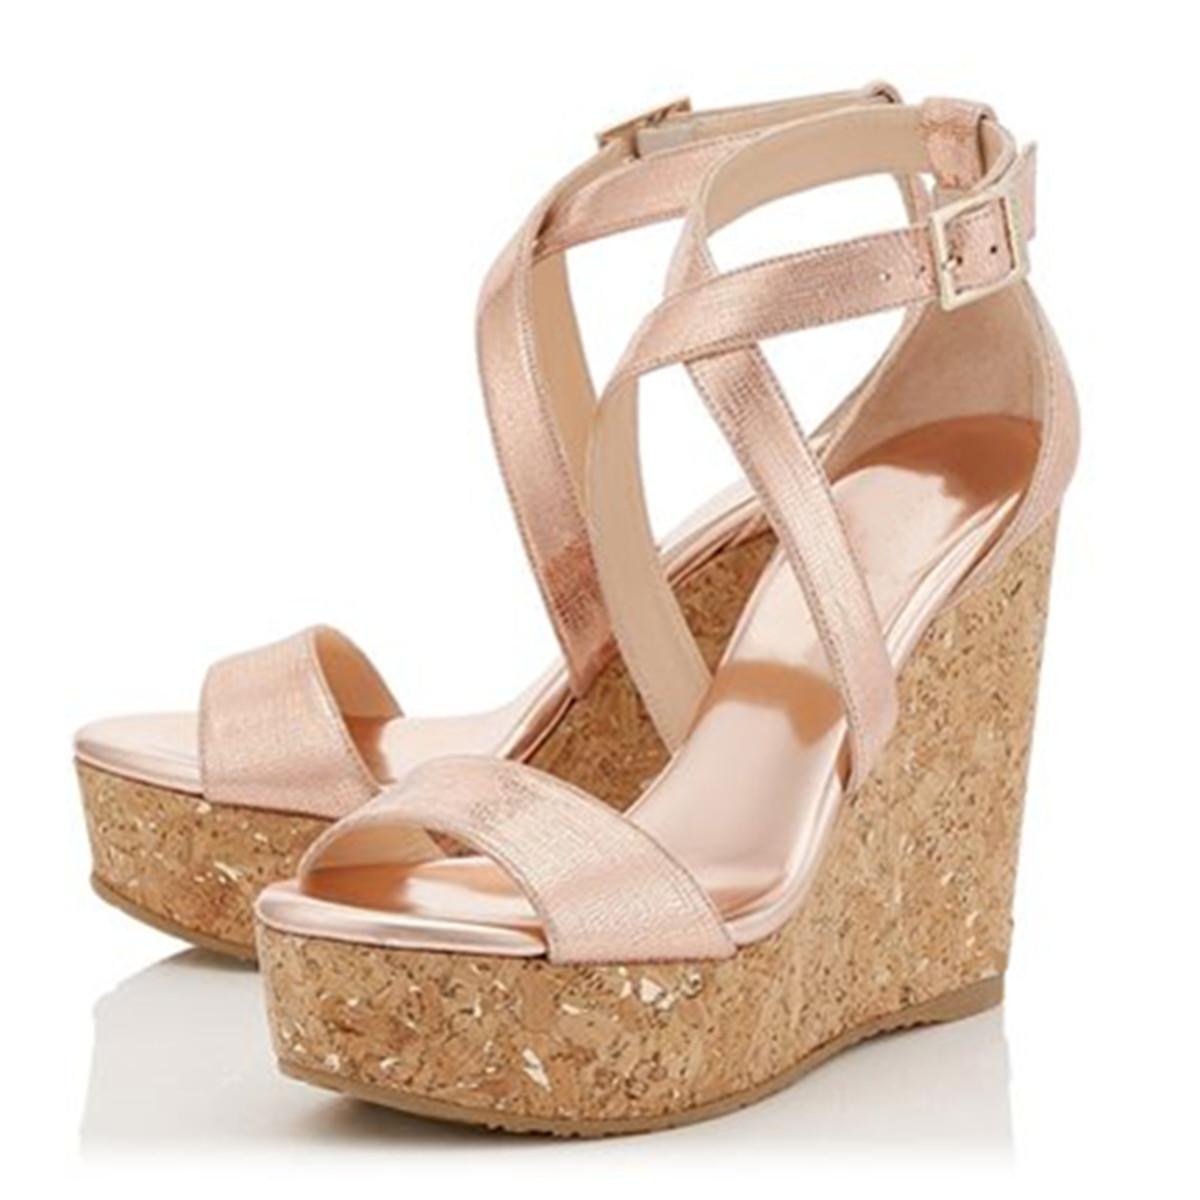 98ff066ea48a US  49 - 2018 summer high heels 14cm cork wedges platform open toe casual  sandals big size - www.ardenfurtado.com